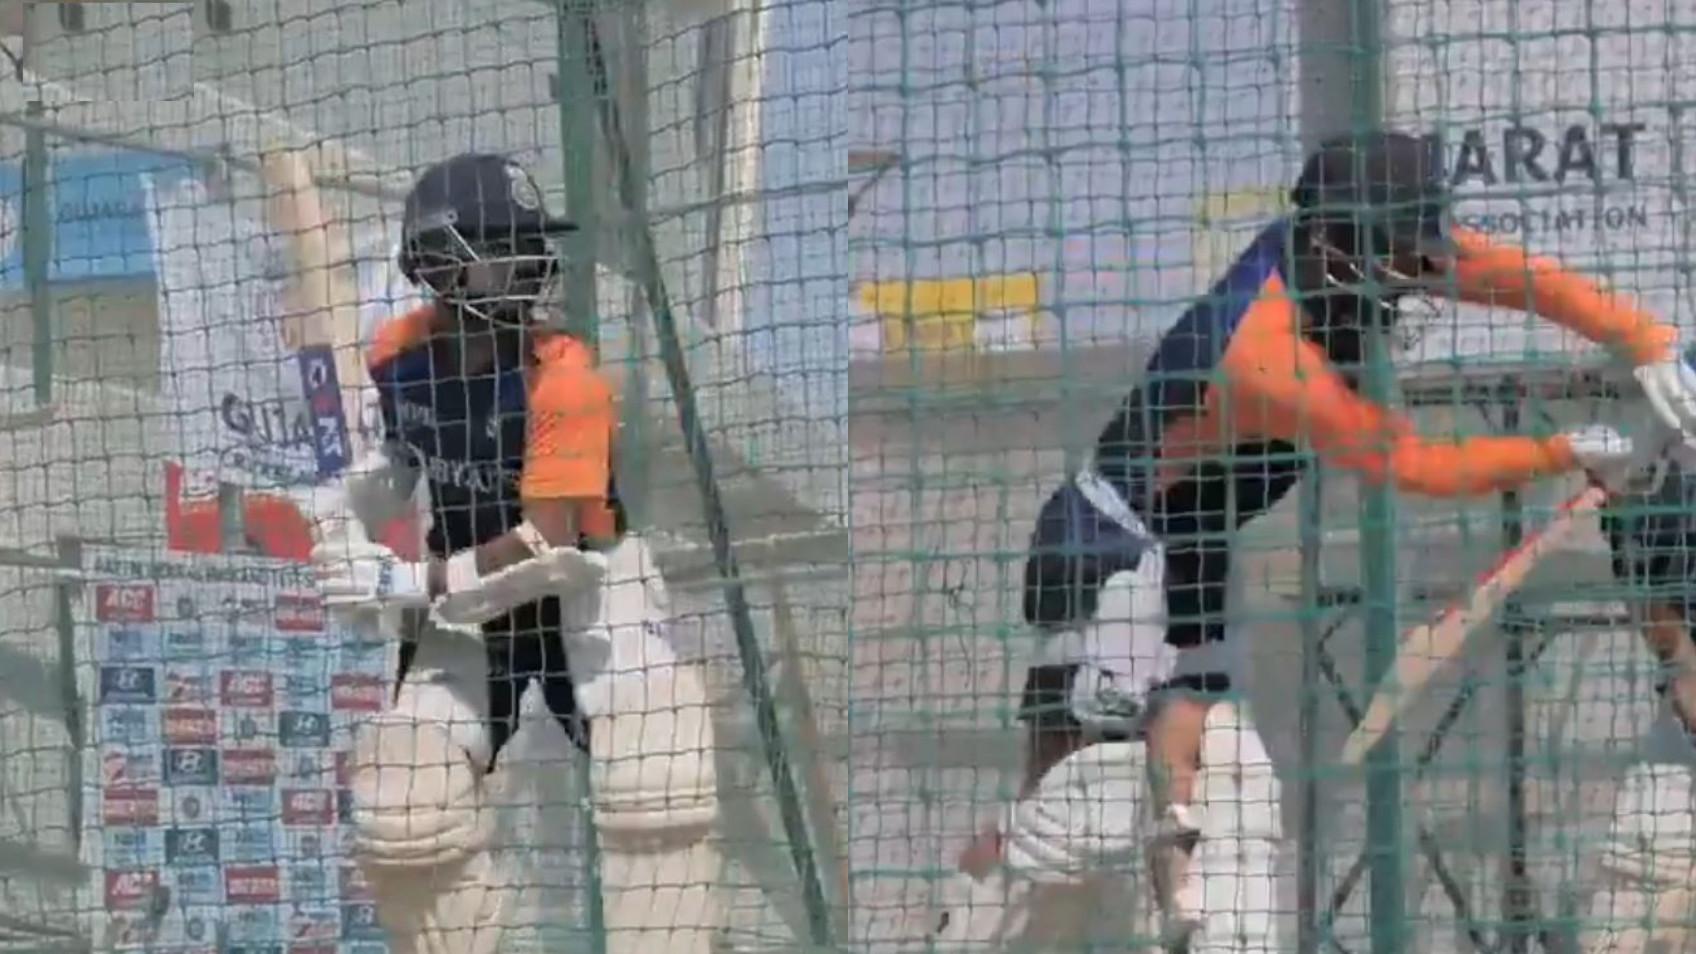 IND v ENG 2021: WATCH- BCCI shares video of Virat Kohli, Ajinkya Rahane and team India's net session